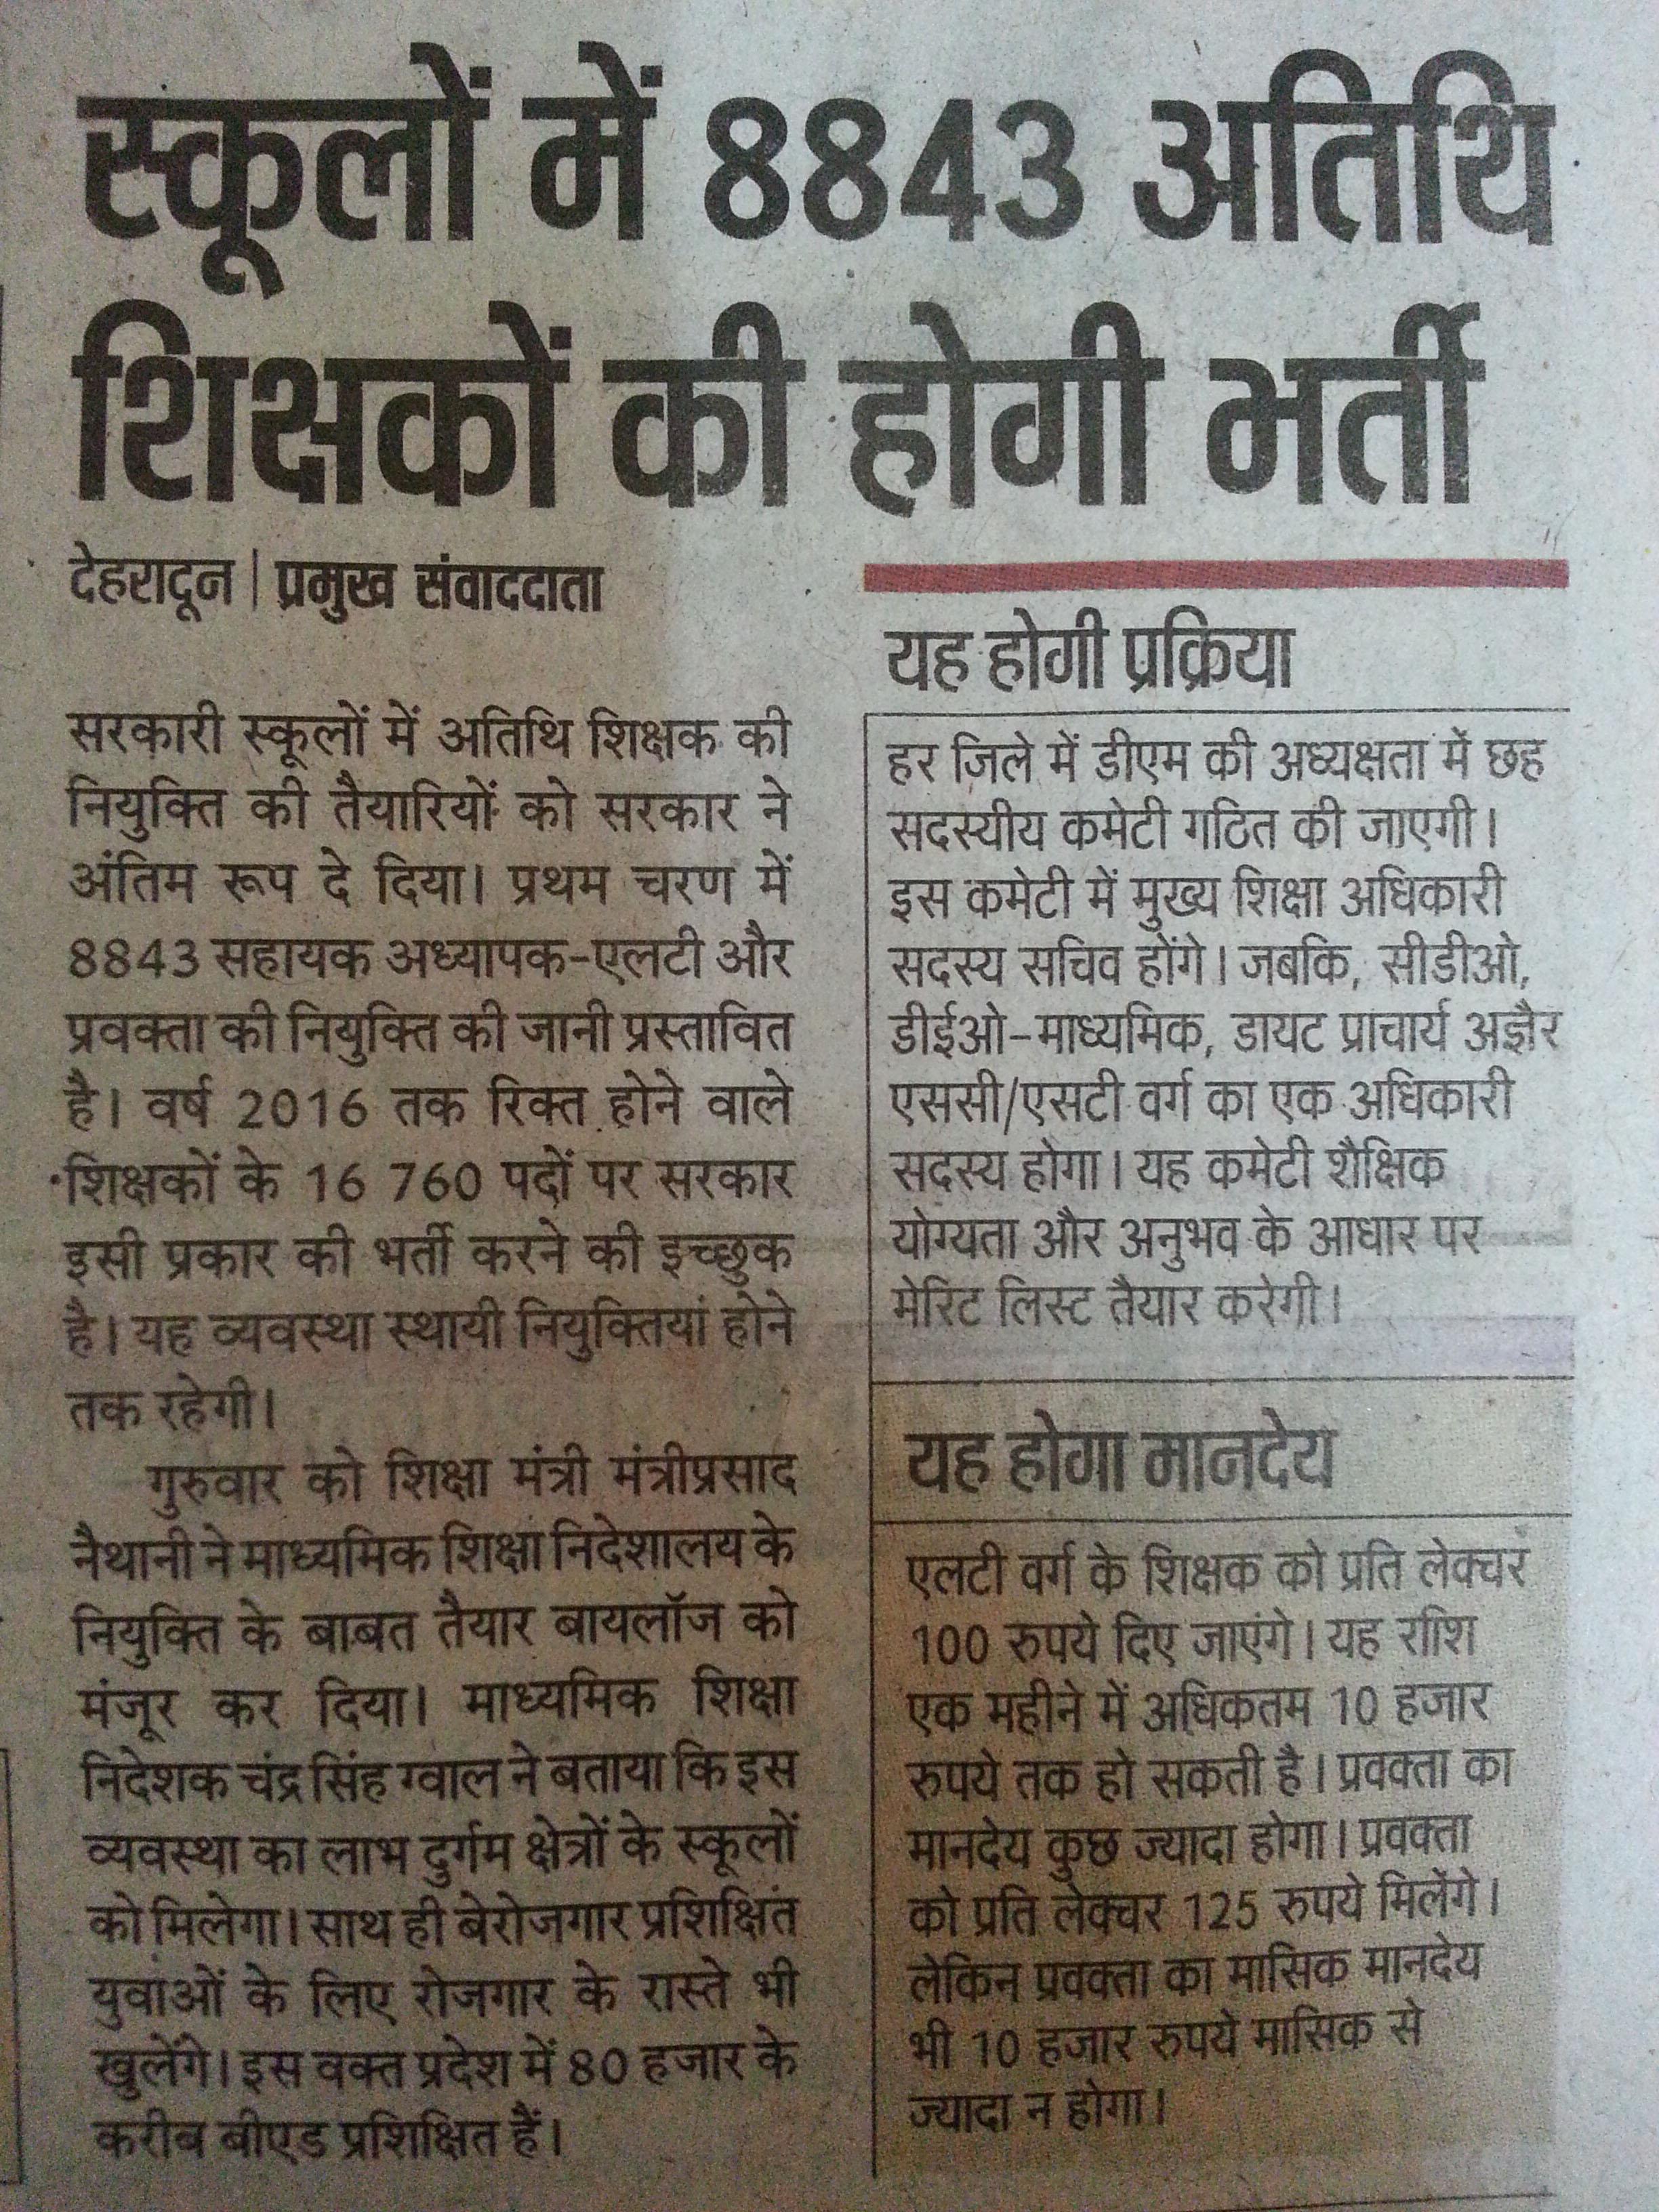 8843 Guest Teachers Recruitment News Atithi Shikshak